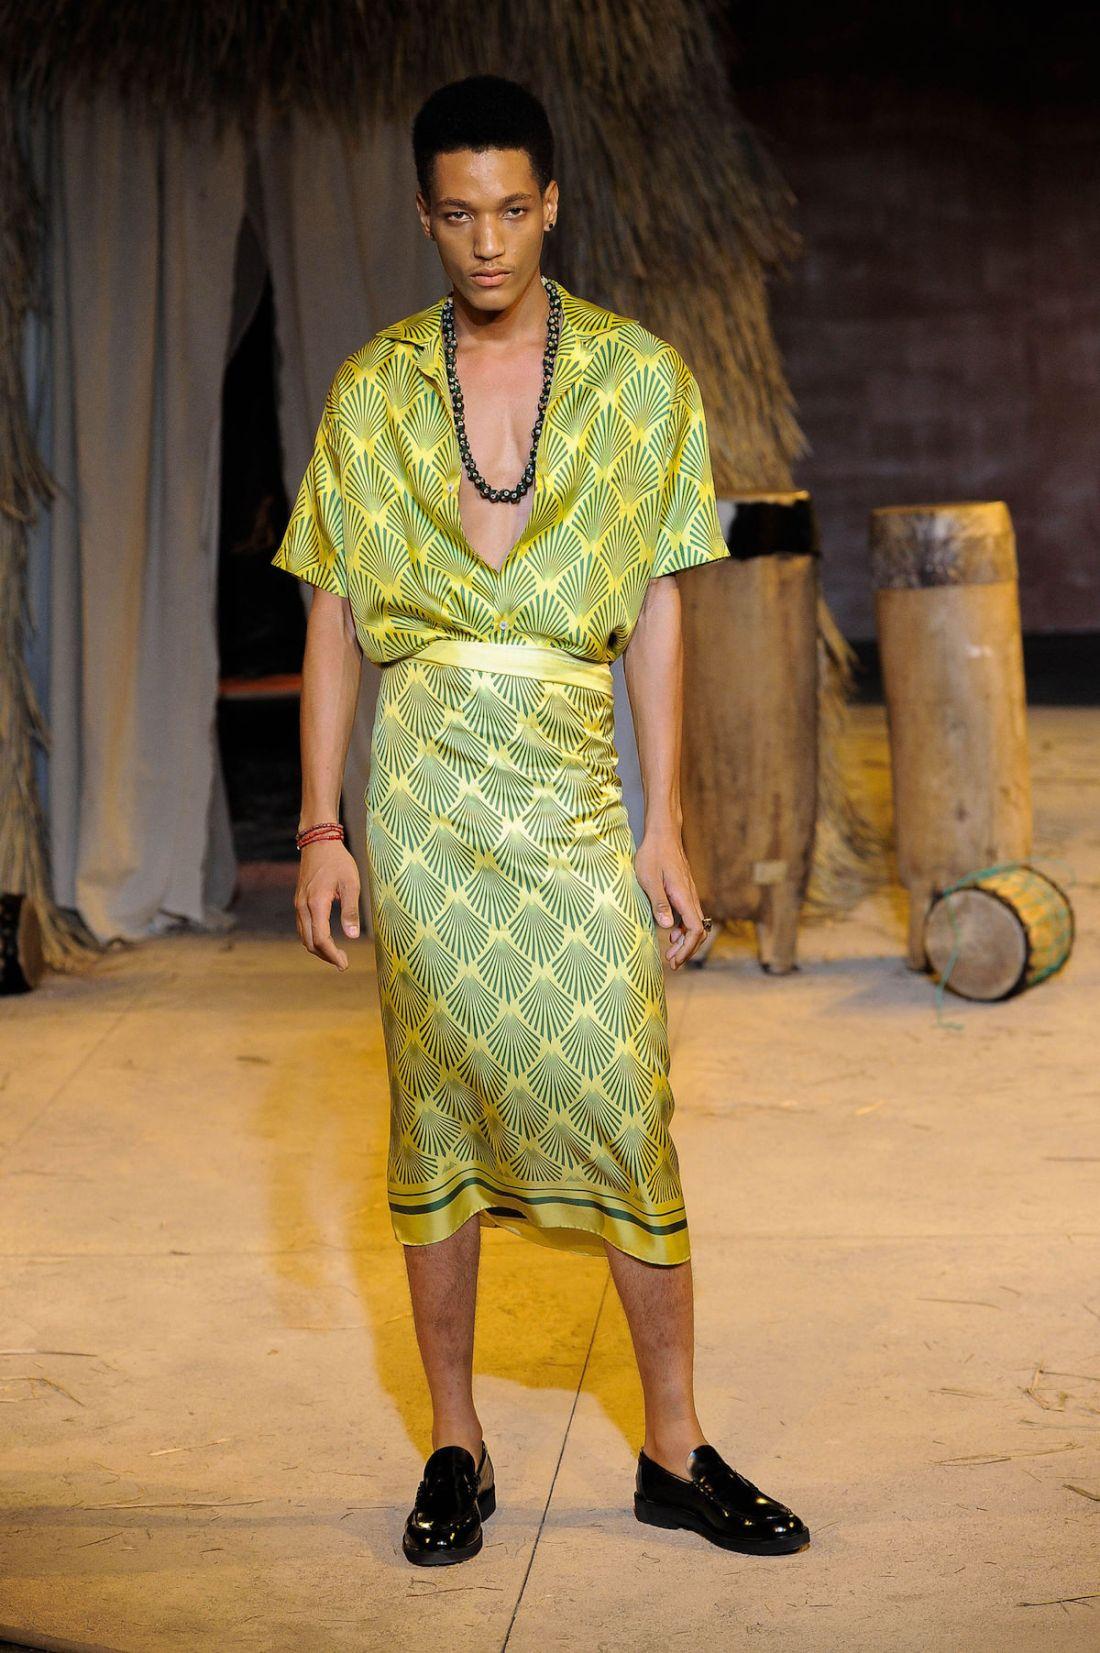 Teddy Ondo Ella, Gabon Fashion, Gabon Culture, African Fashion, KOLUMN Magazine, KOLUMN